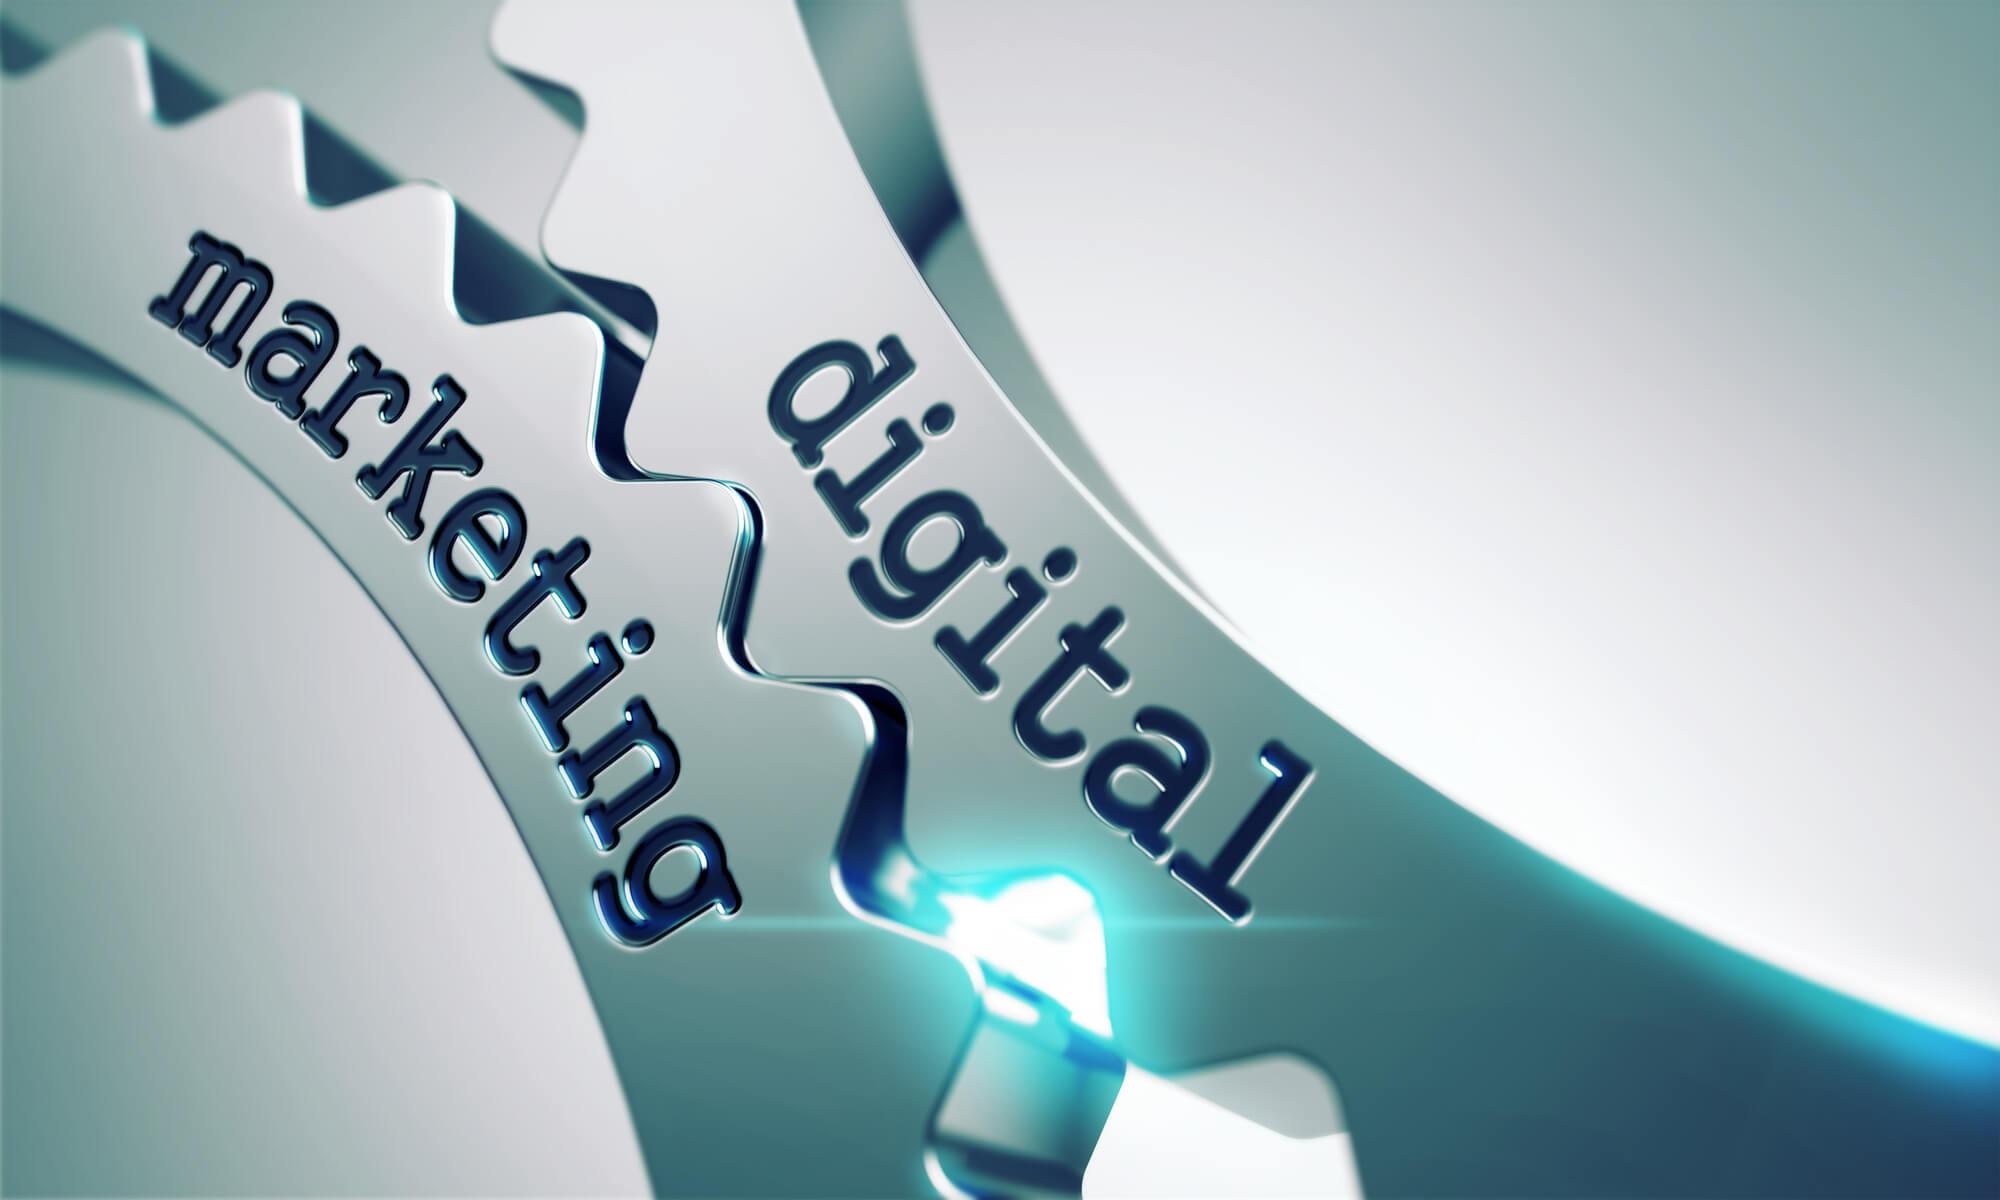 web design, seo, and digital marketing agency orange county - The Ad Firm